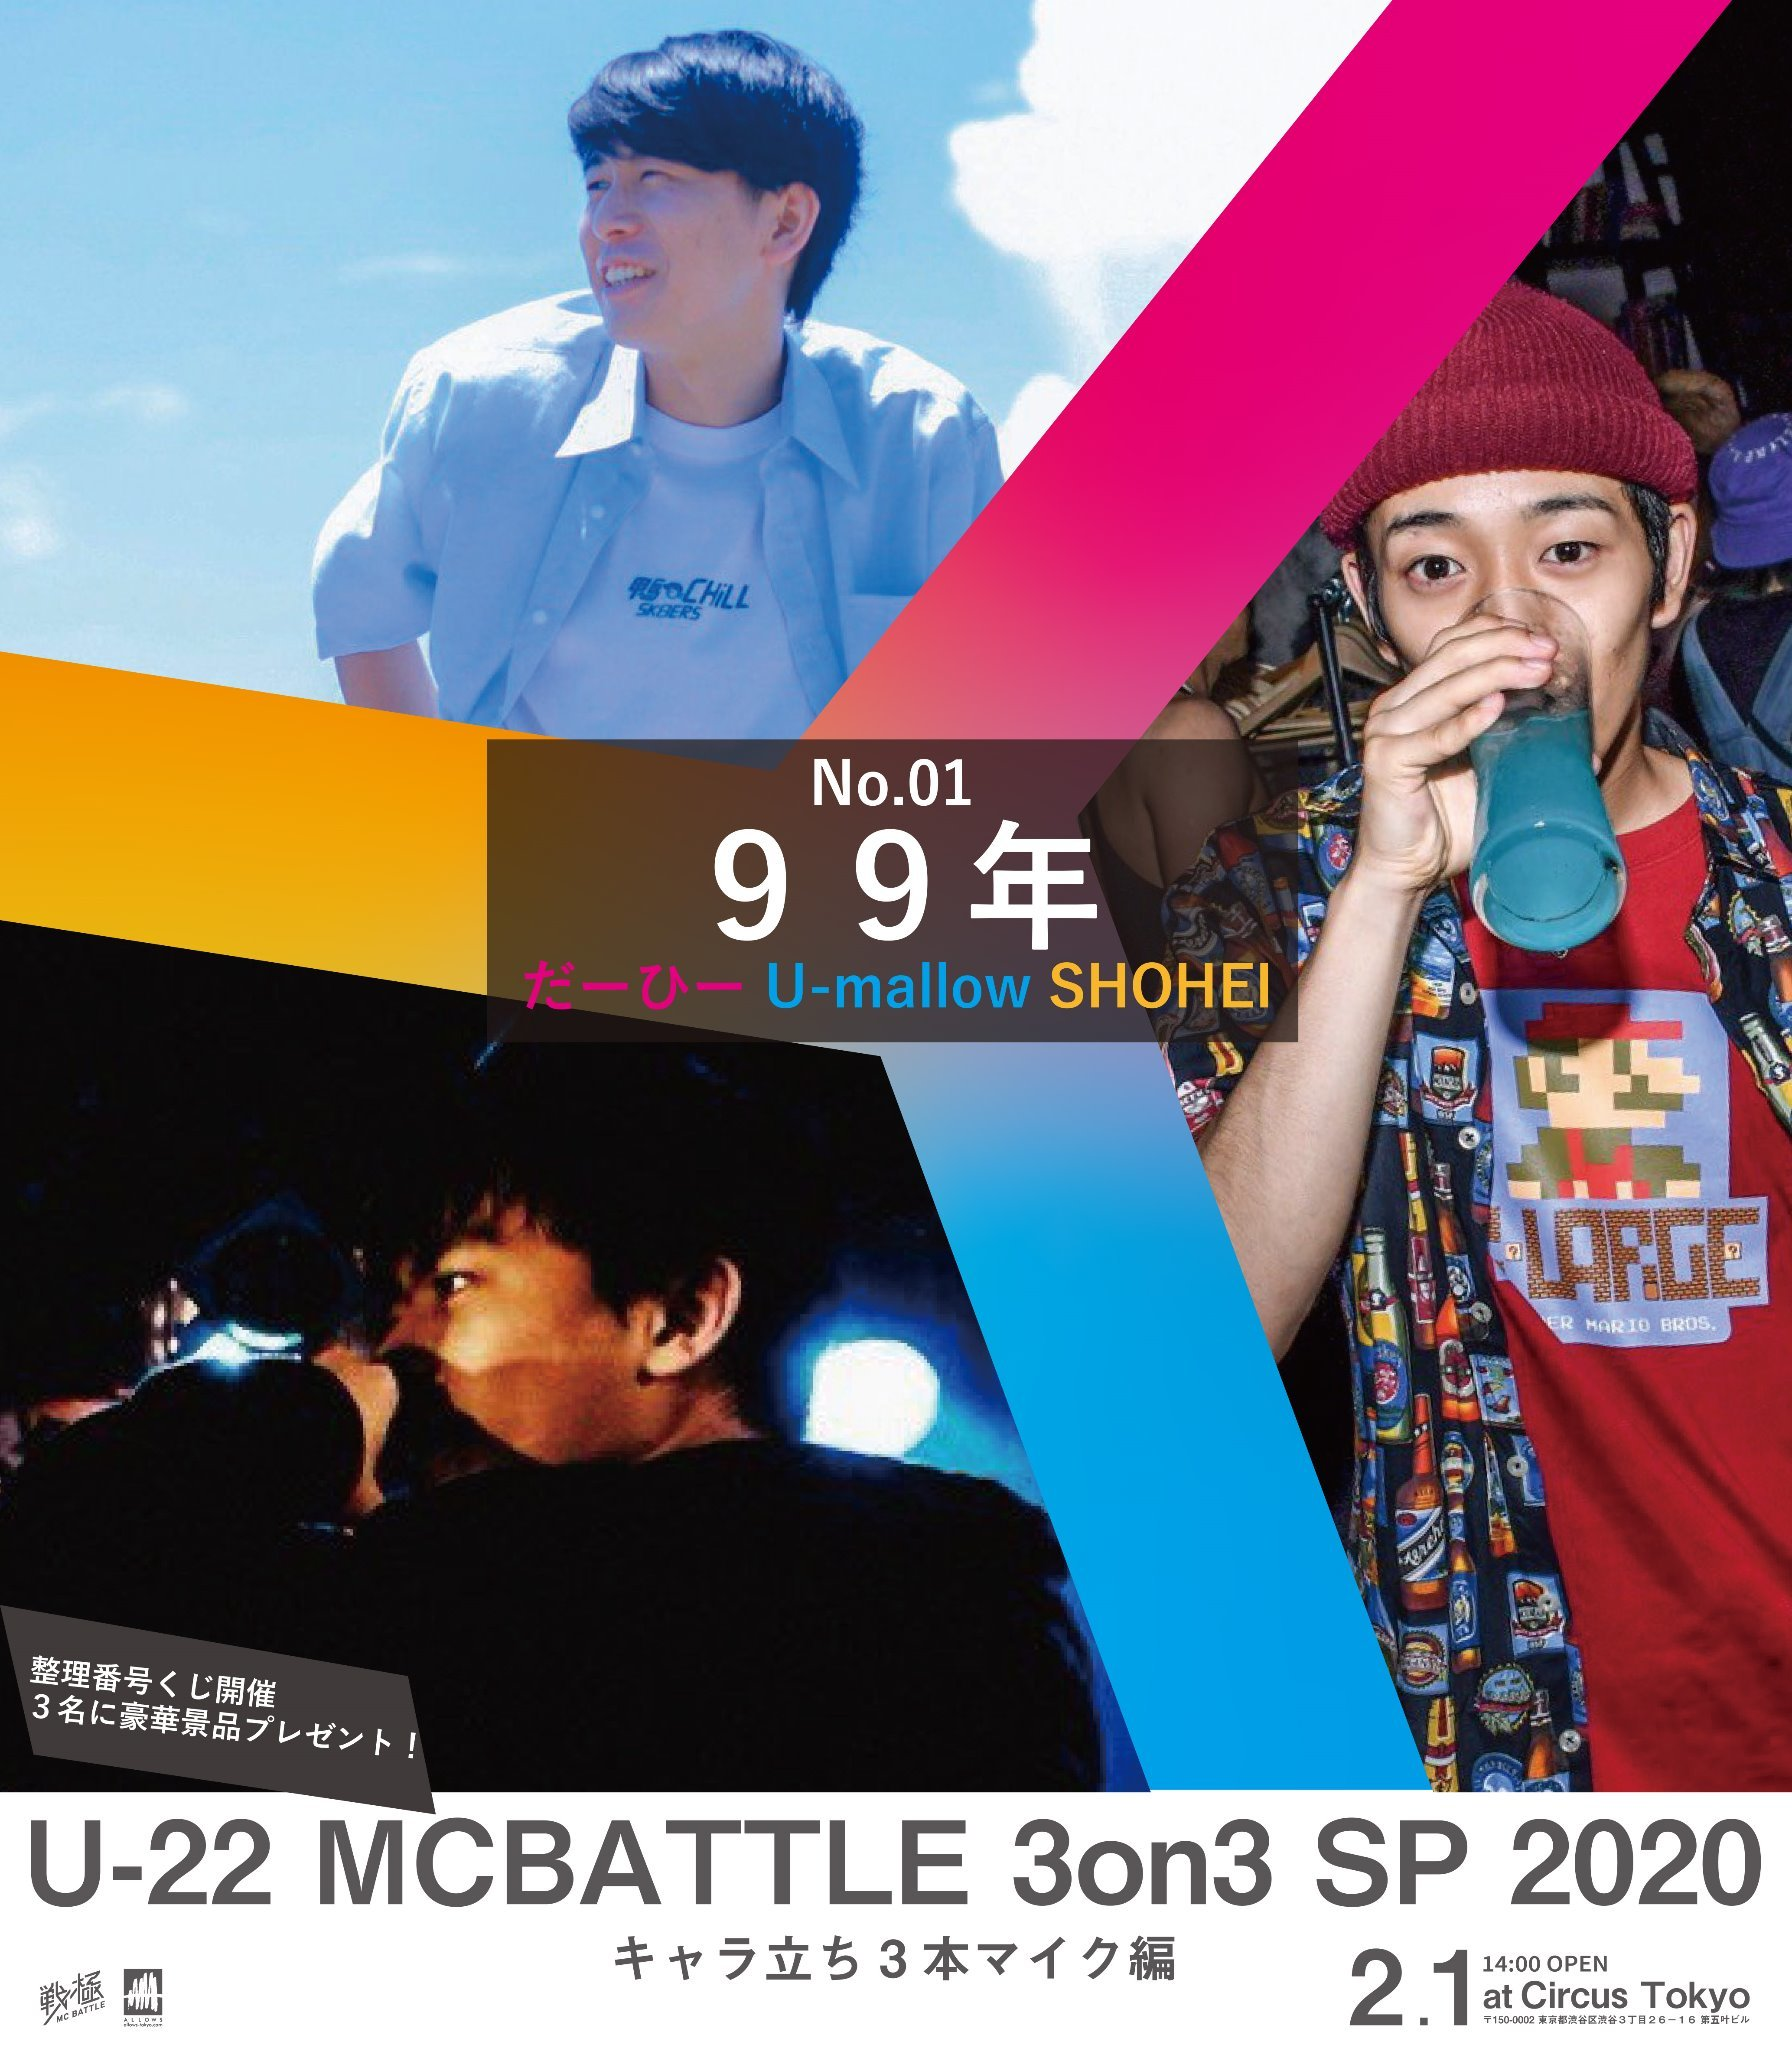 2/1 U-22 MCBATTLE 3on3 SP 2020 チケット販売開始!8チーム中!_e0246863_22304060.jpg